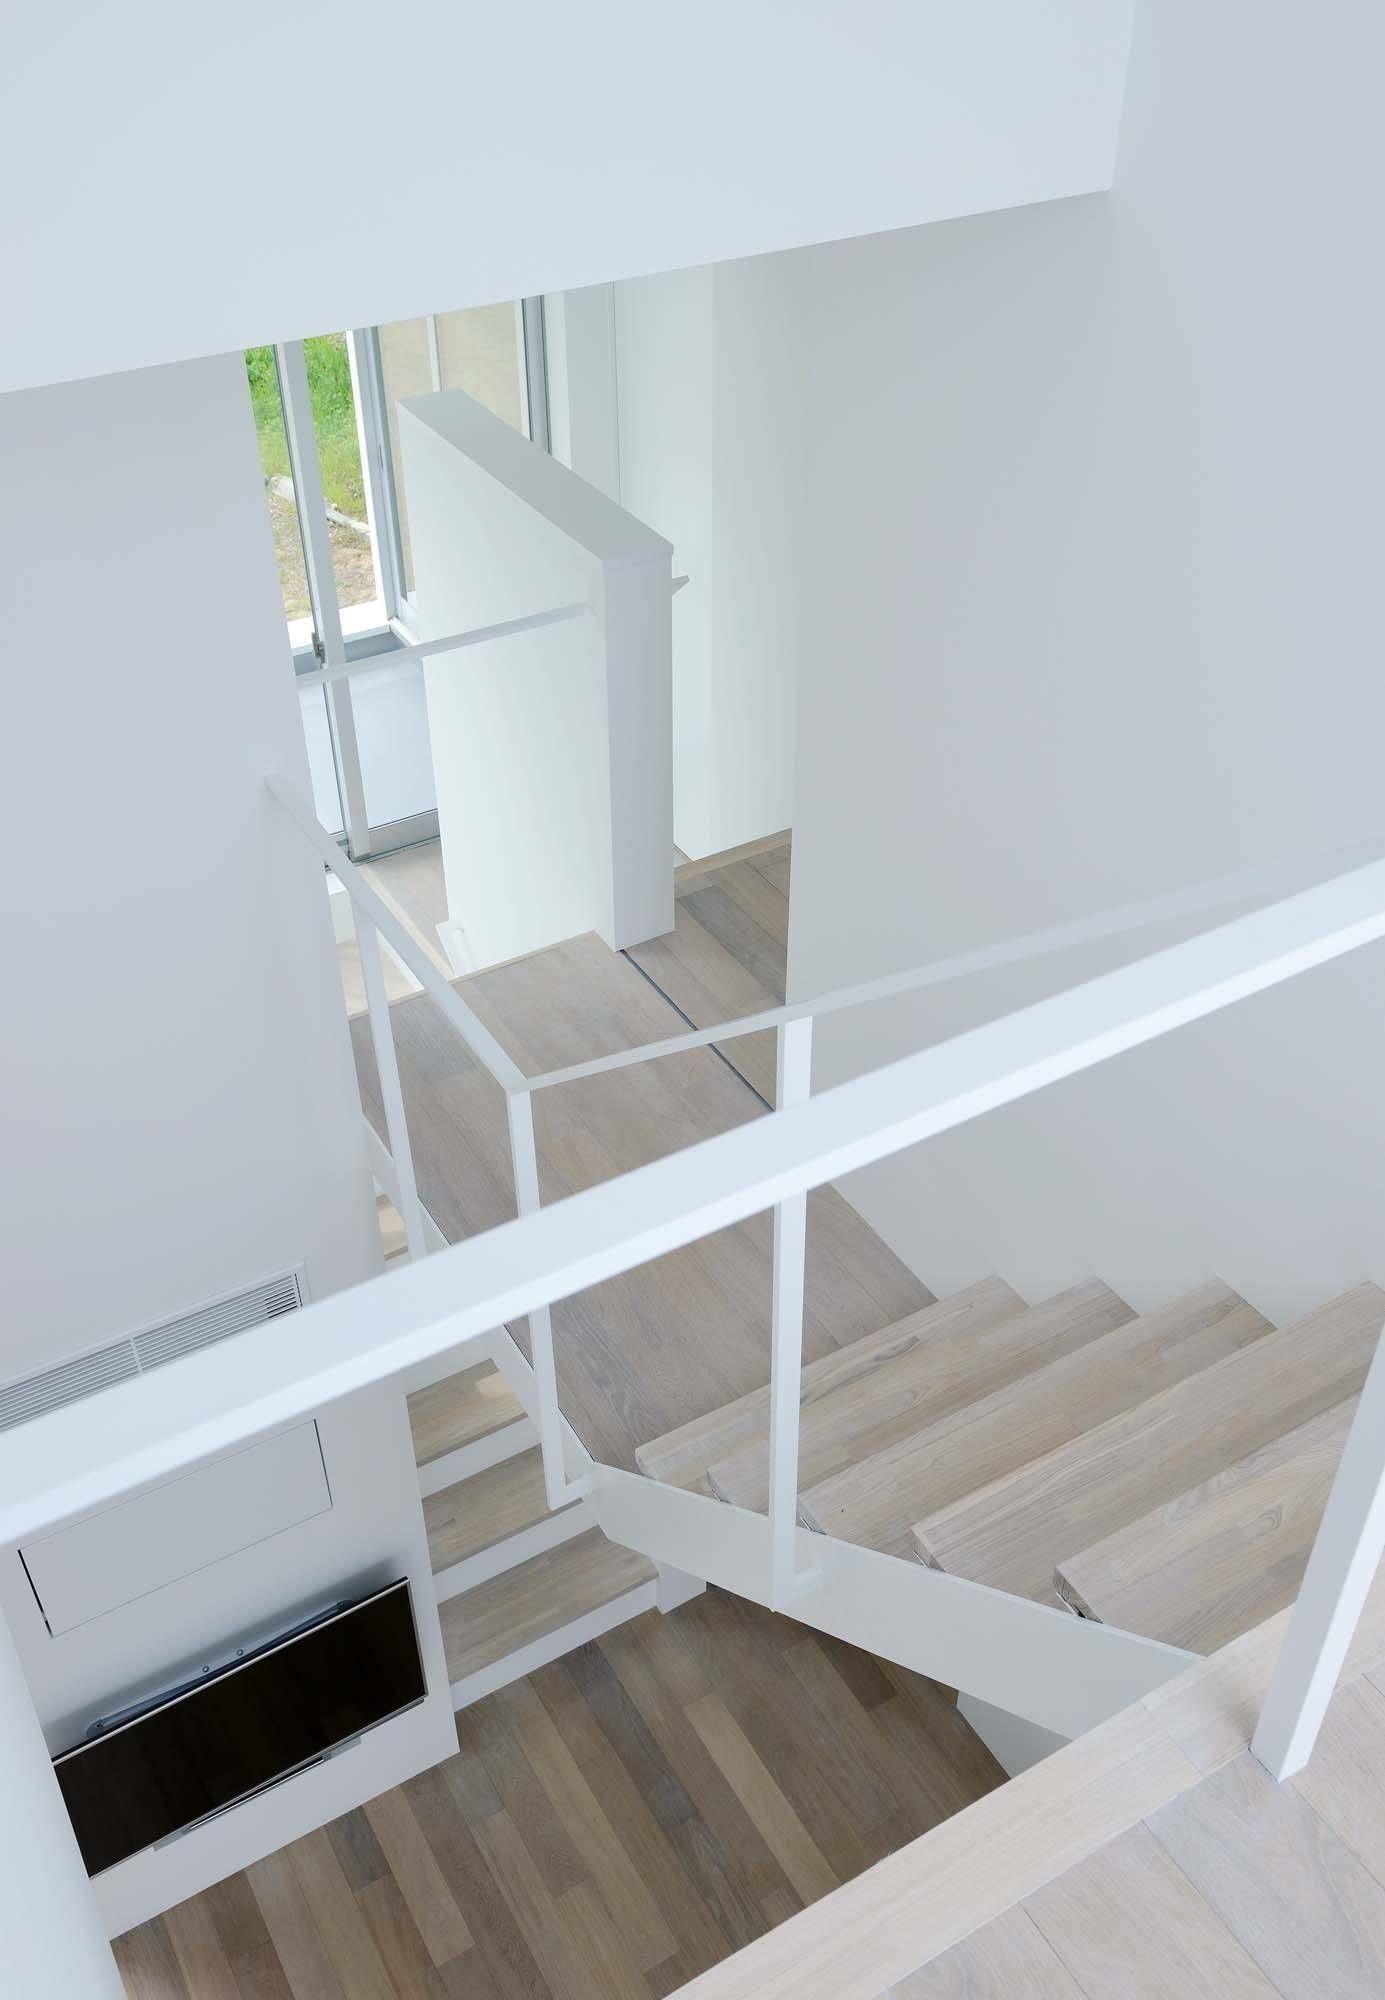 House Of Eirakusou Minimalist Home House Plans Contemporary House Plans